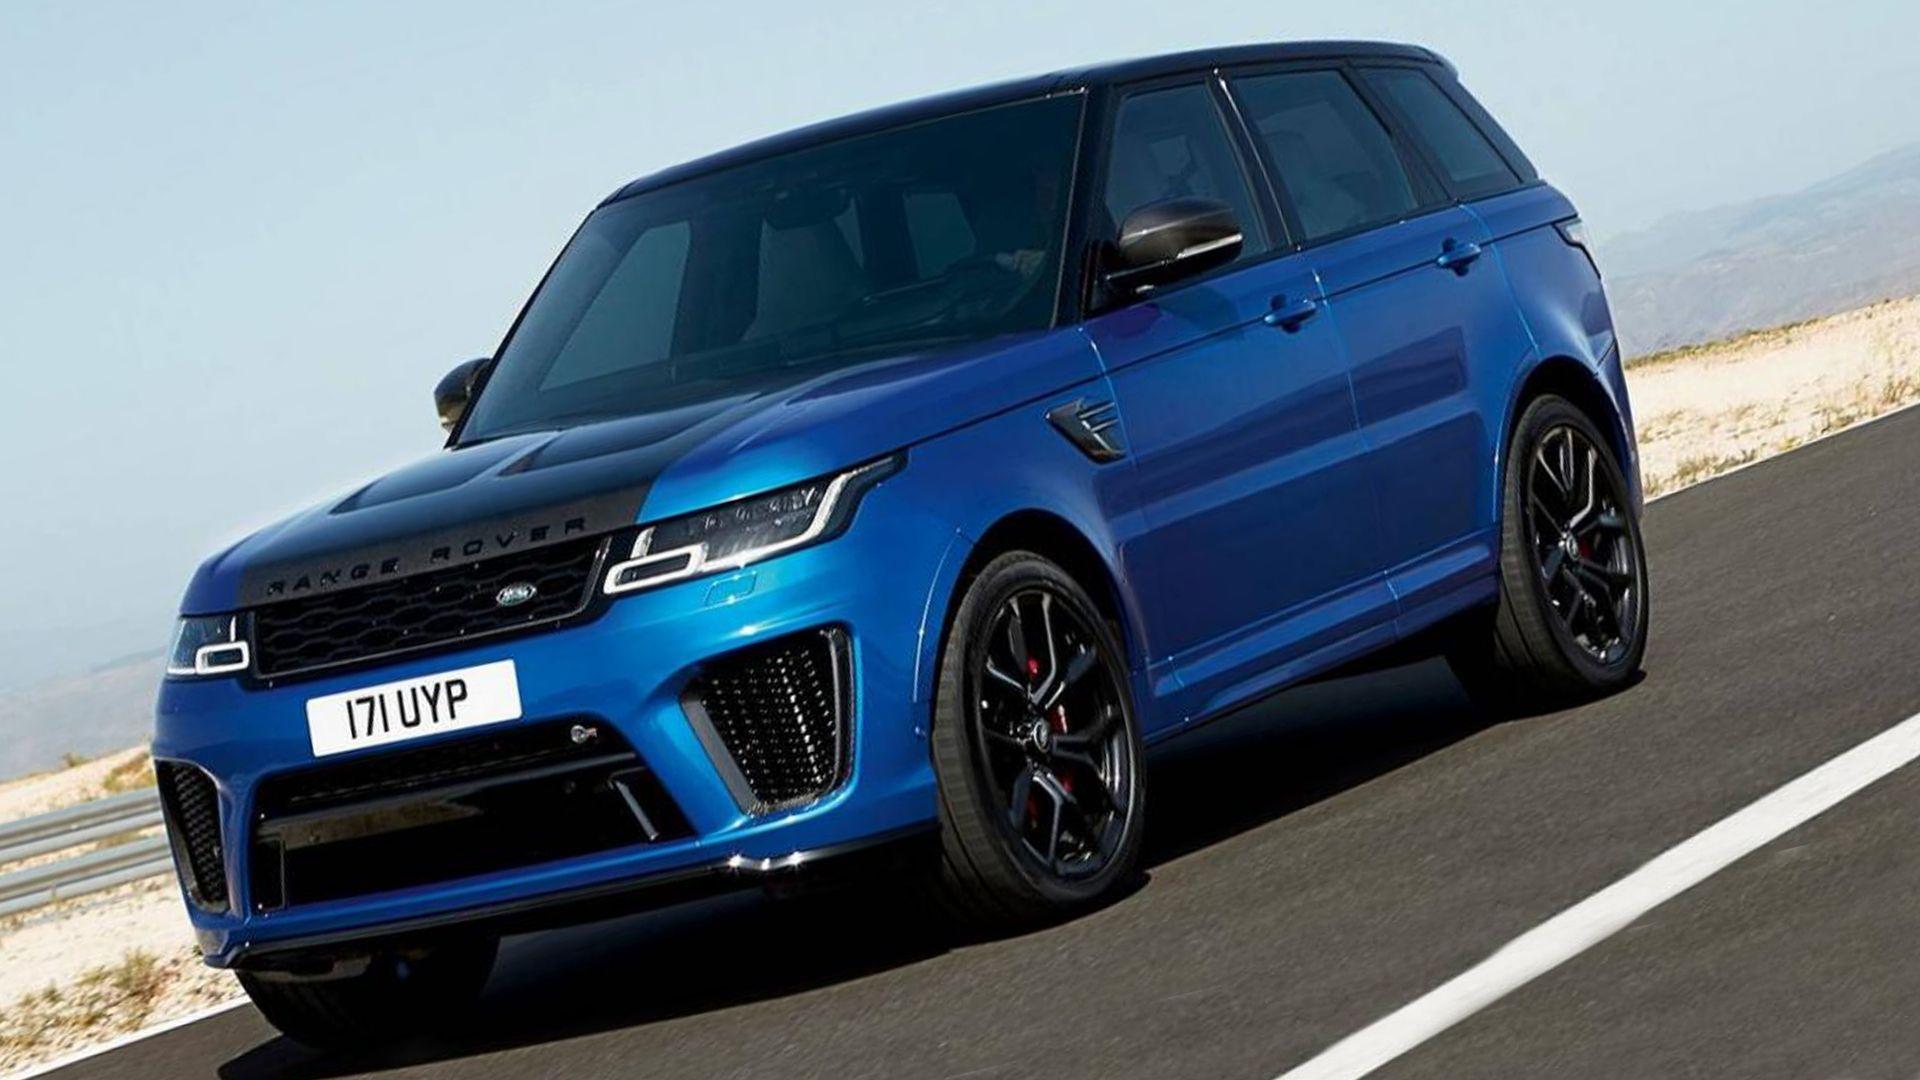 2019 Range Rover Sport Concept Specs In 2020 Range Rover Range Rover Sport Range Rover Sport Price